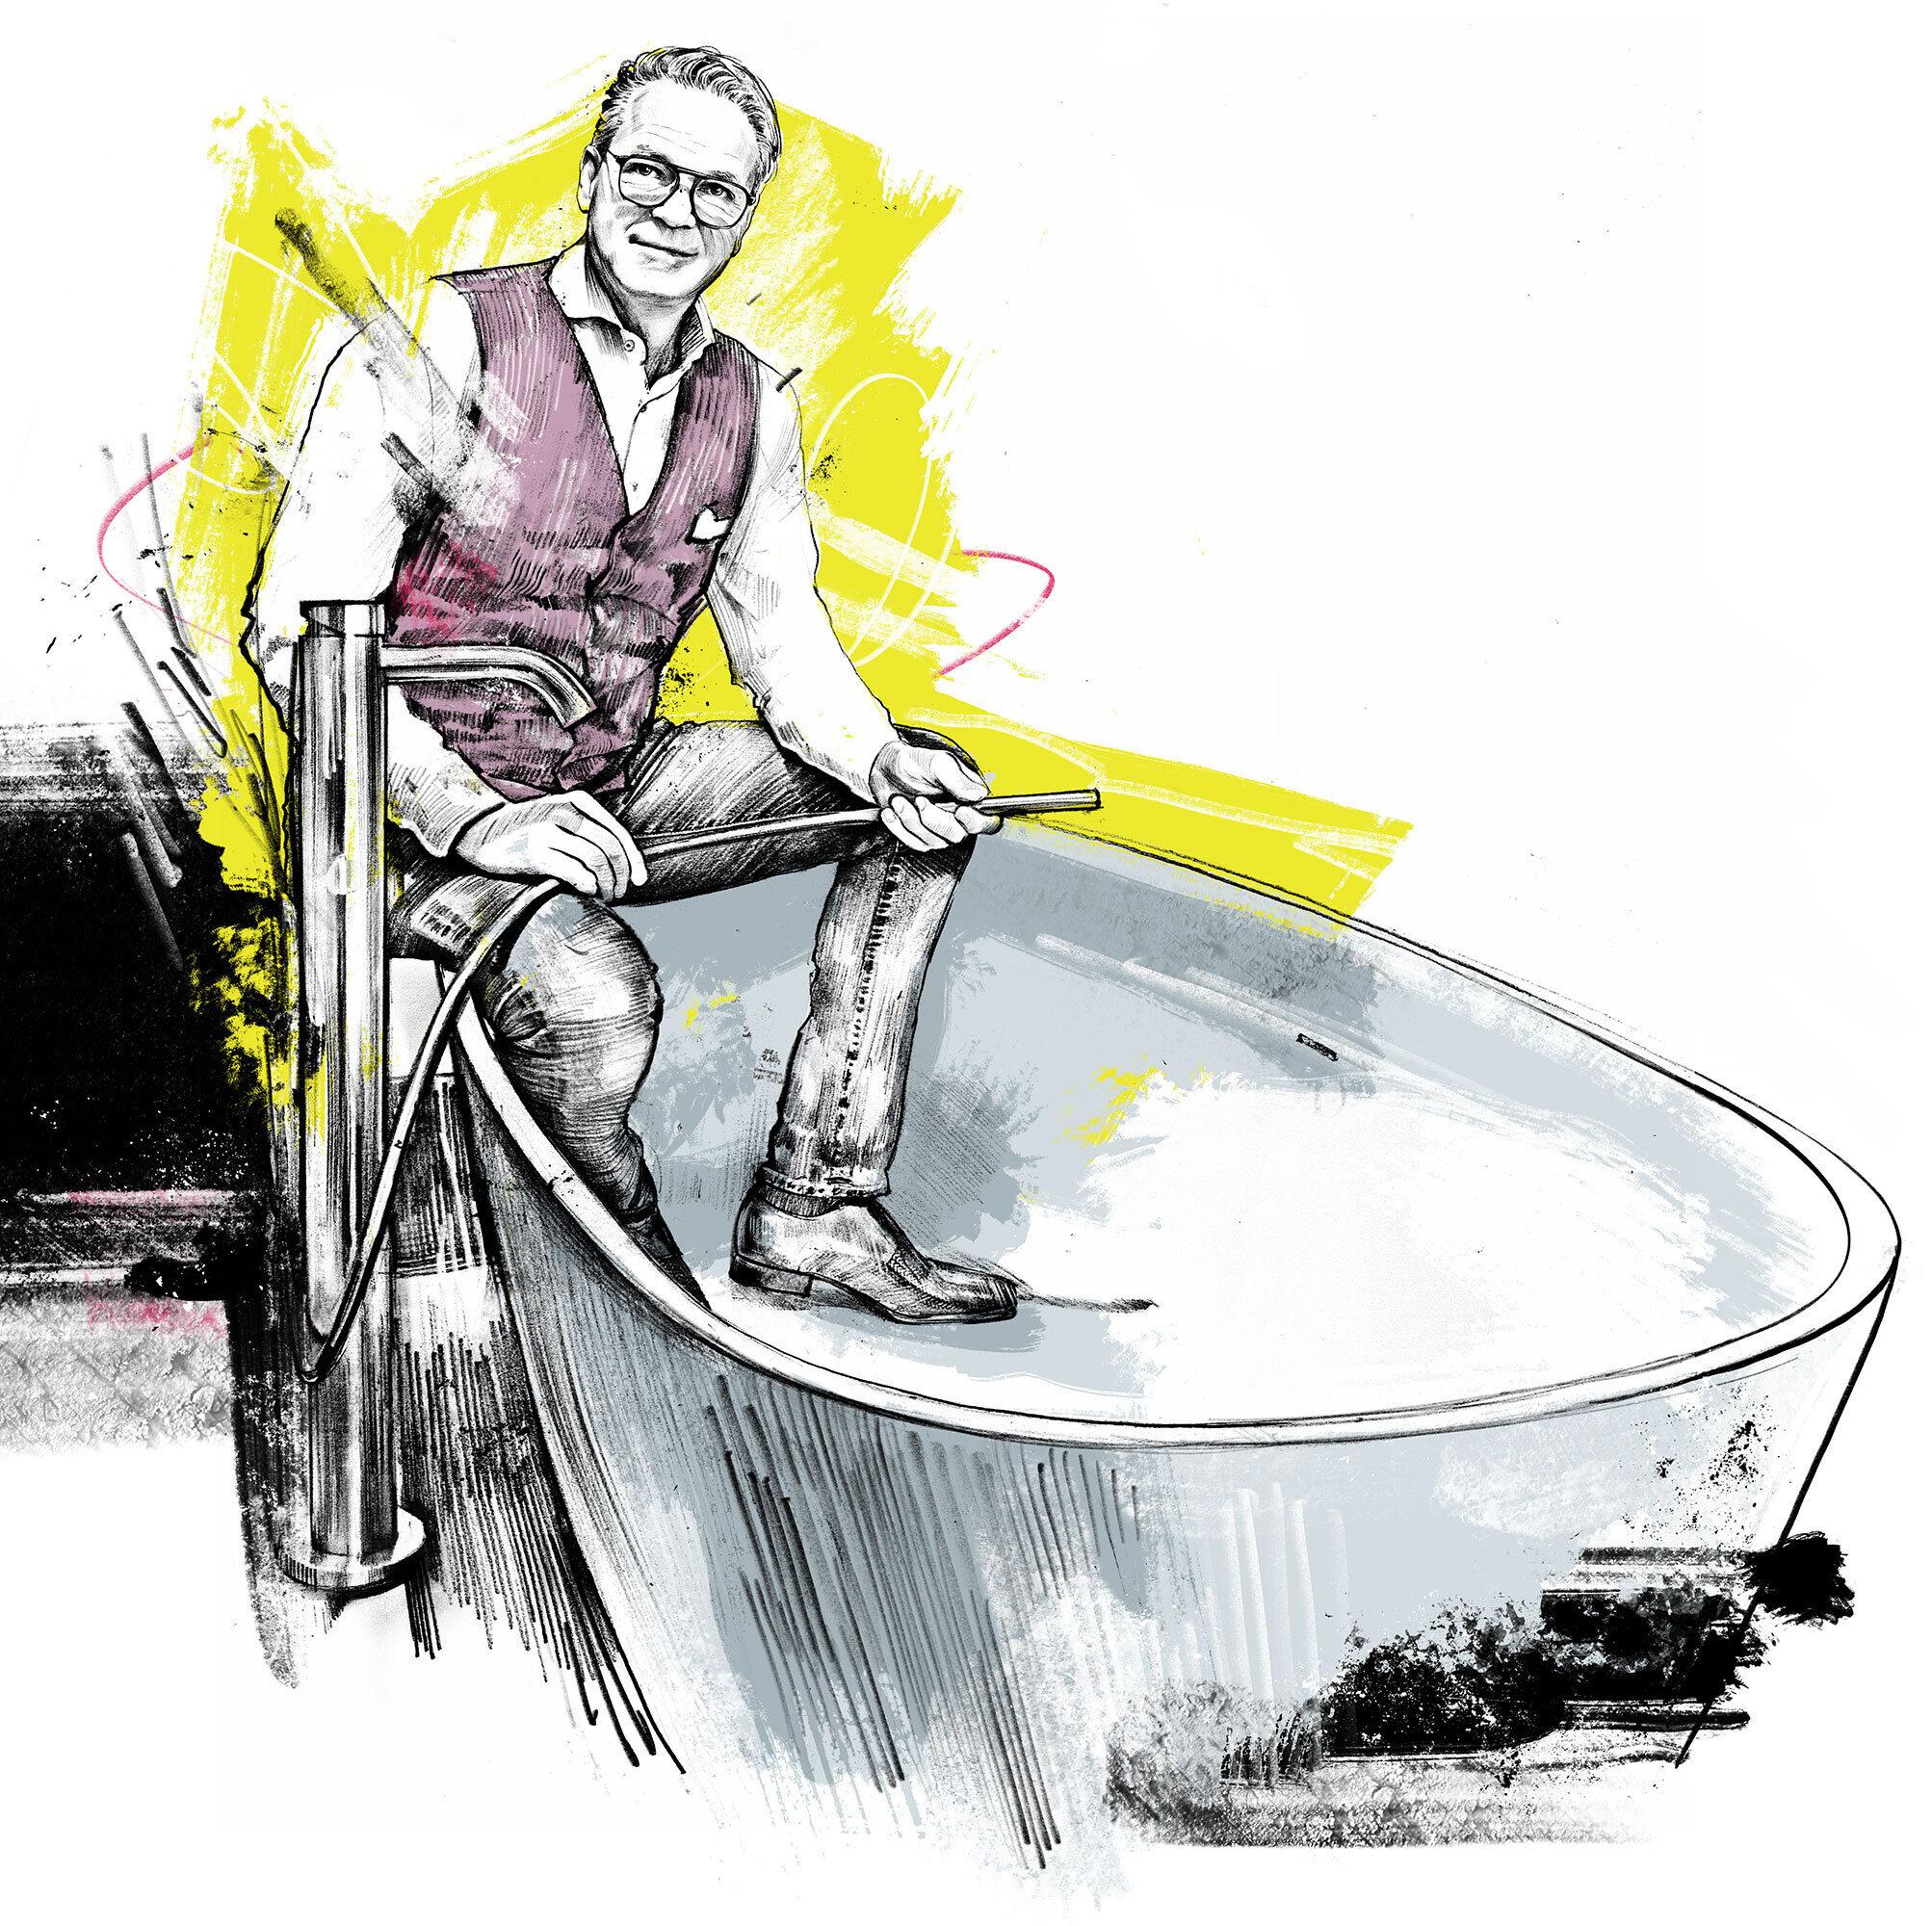 Marc Beeli - Kornel Illustration | Kornel Stadler portfolio